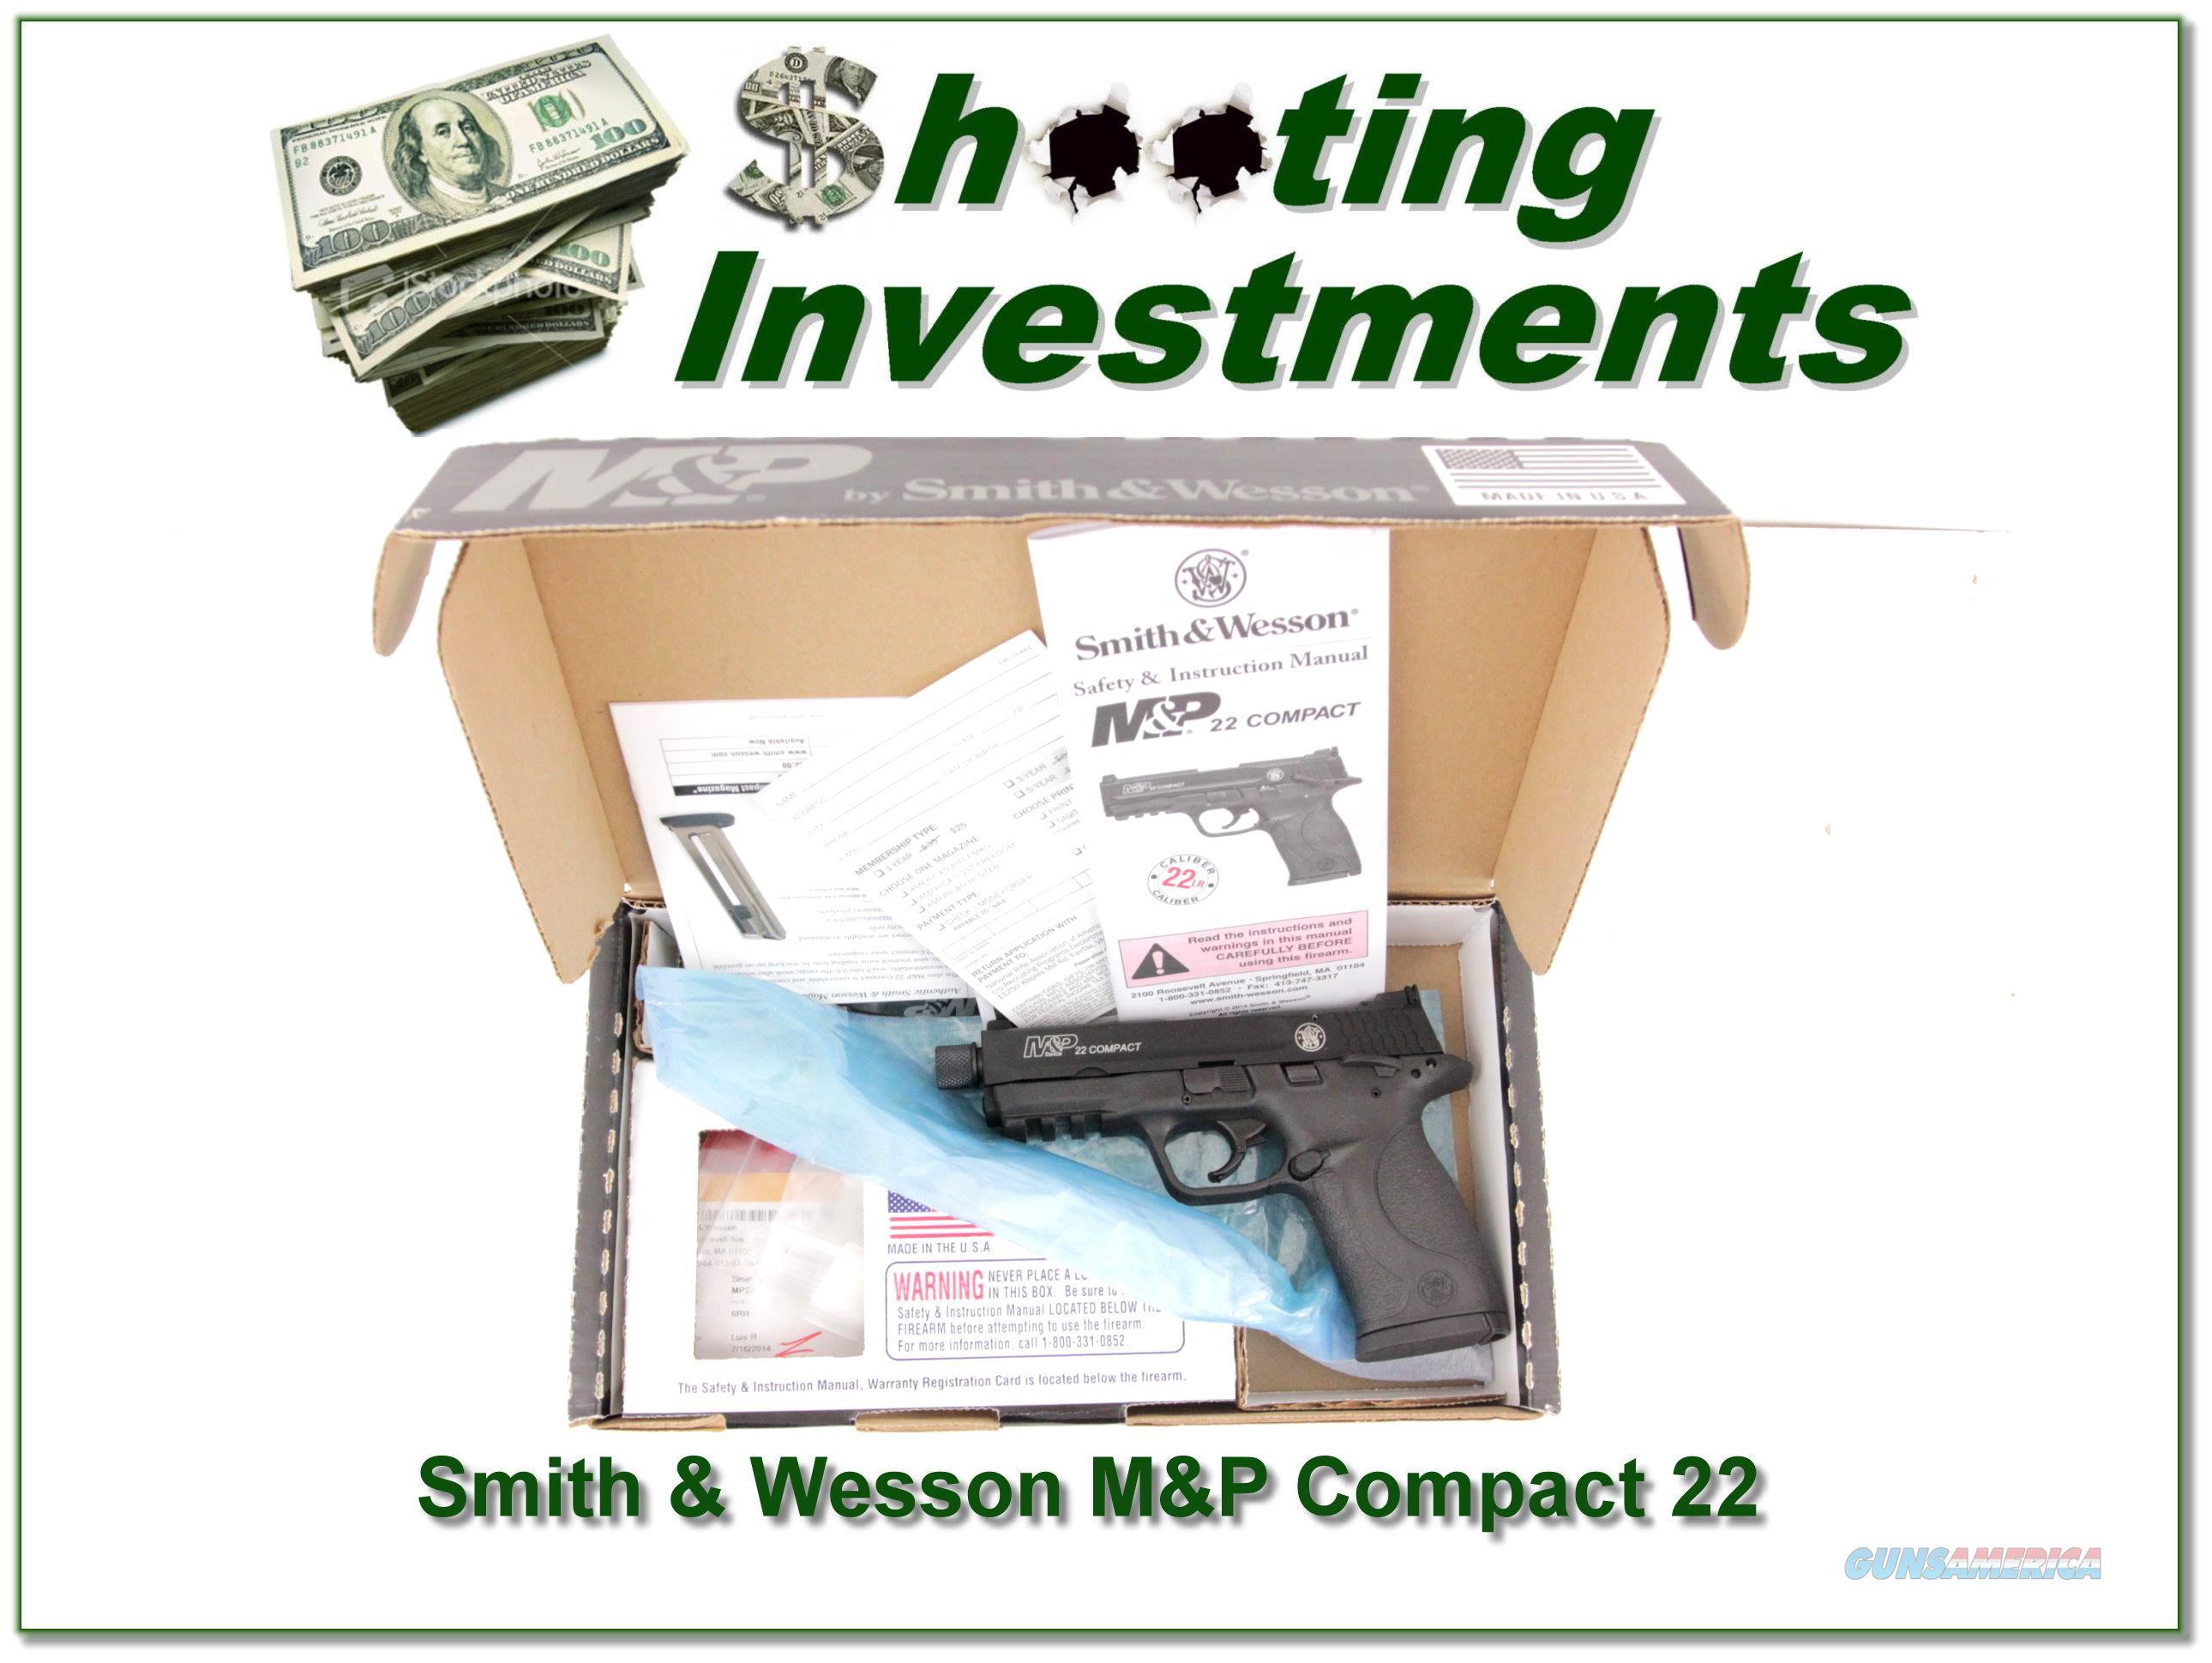 Smith & Wesson M&P Compact 22LR Supressor ready NIB  Guns > Pistols > Smith & Wesson Pistols - Autos > .22 Autos